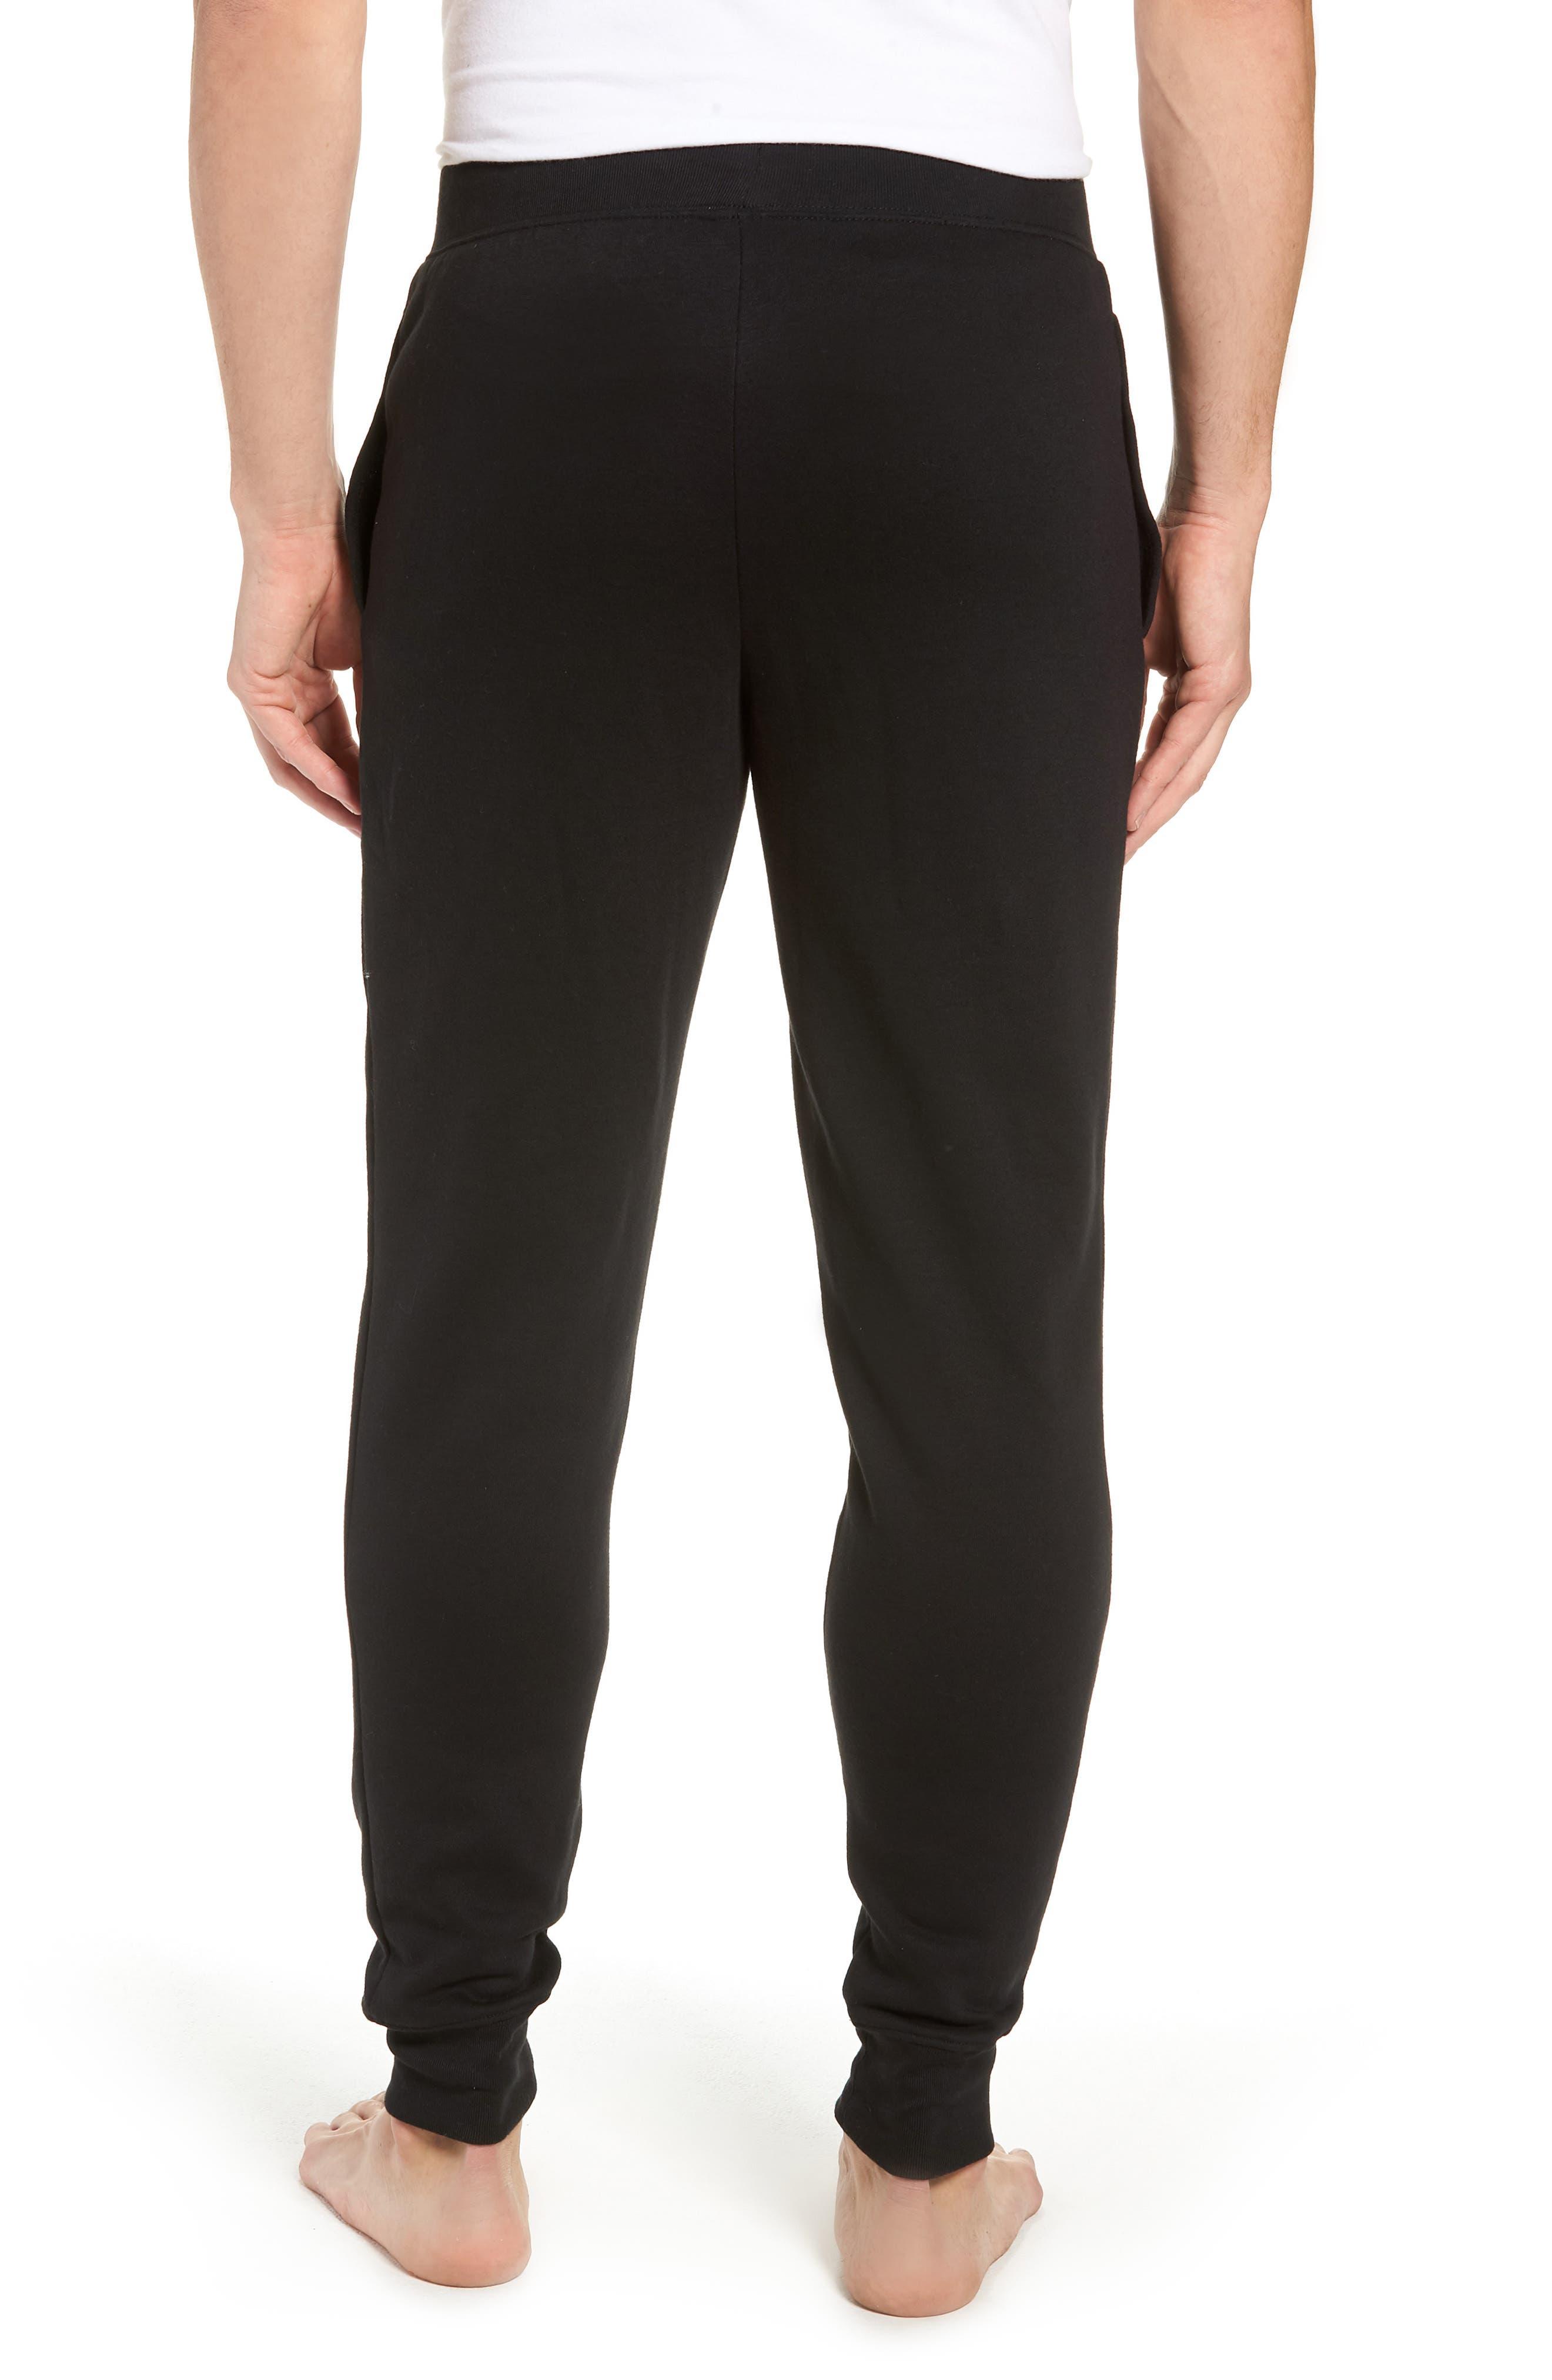 POLO RALPH LAUREN,                             Brushed Jersey Cotton Blend Jogger Pants,                             Alternate thumbnail 2, color,                             POLO BLACK